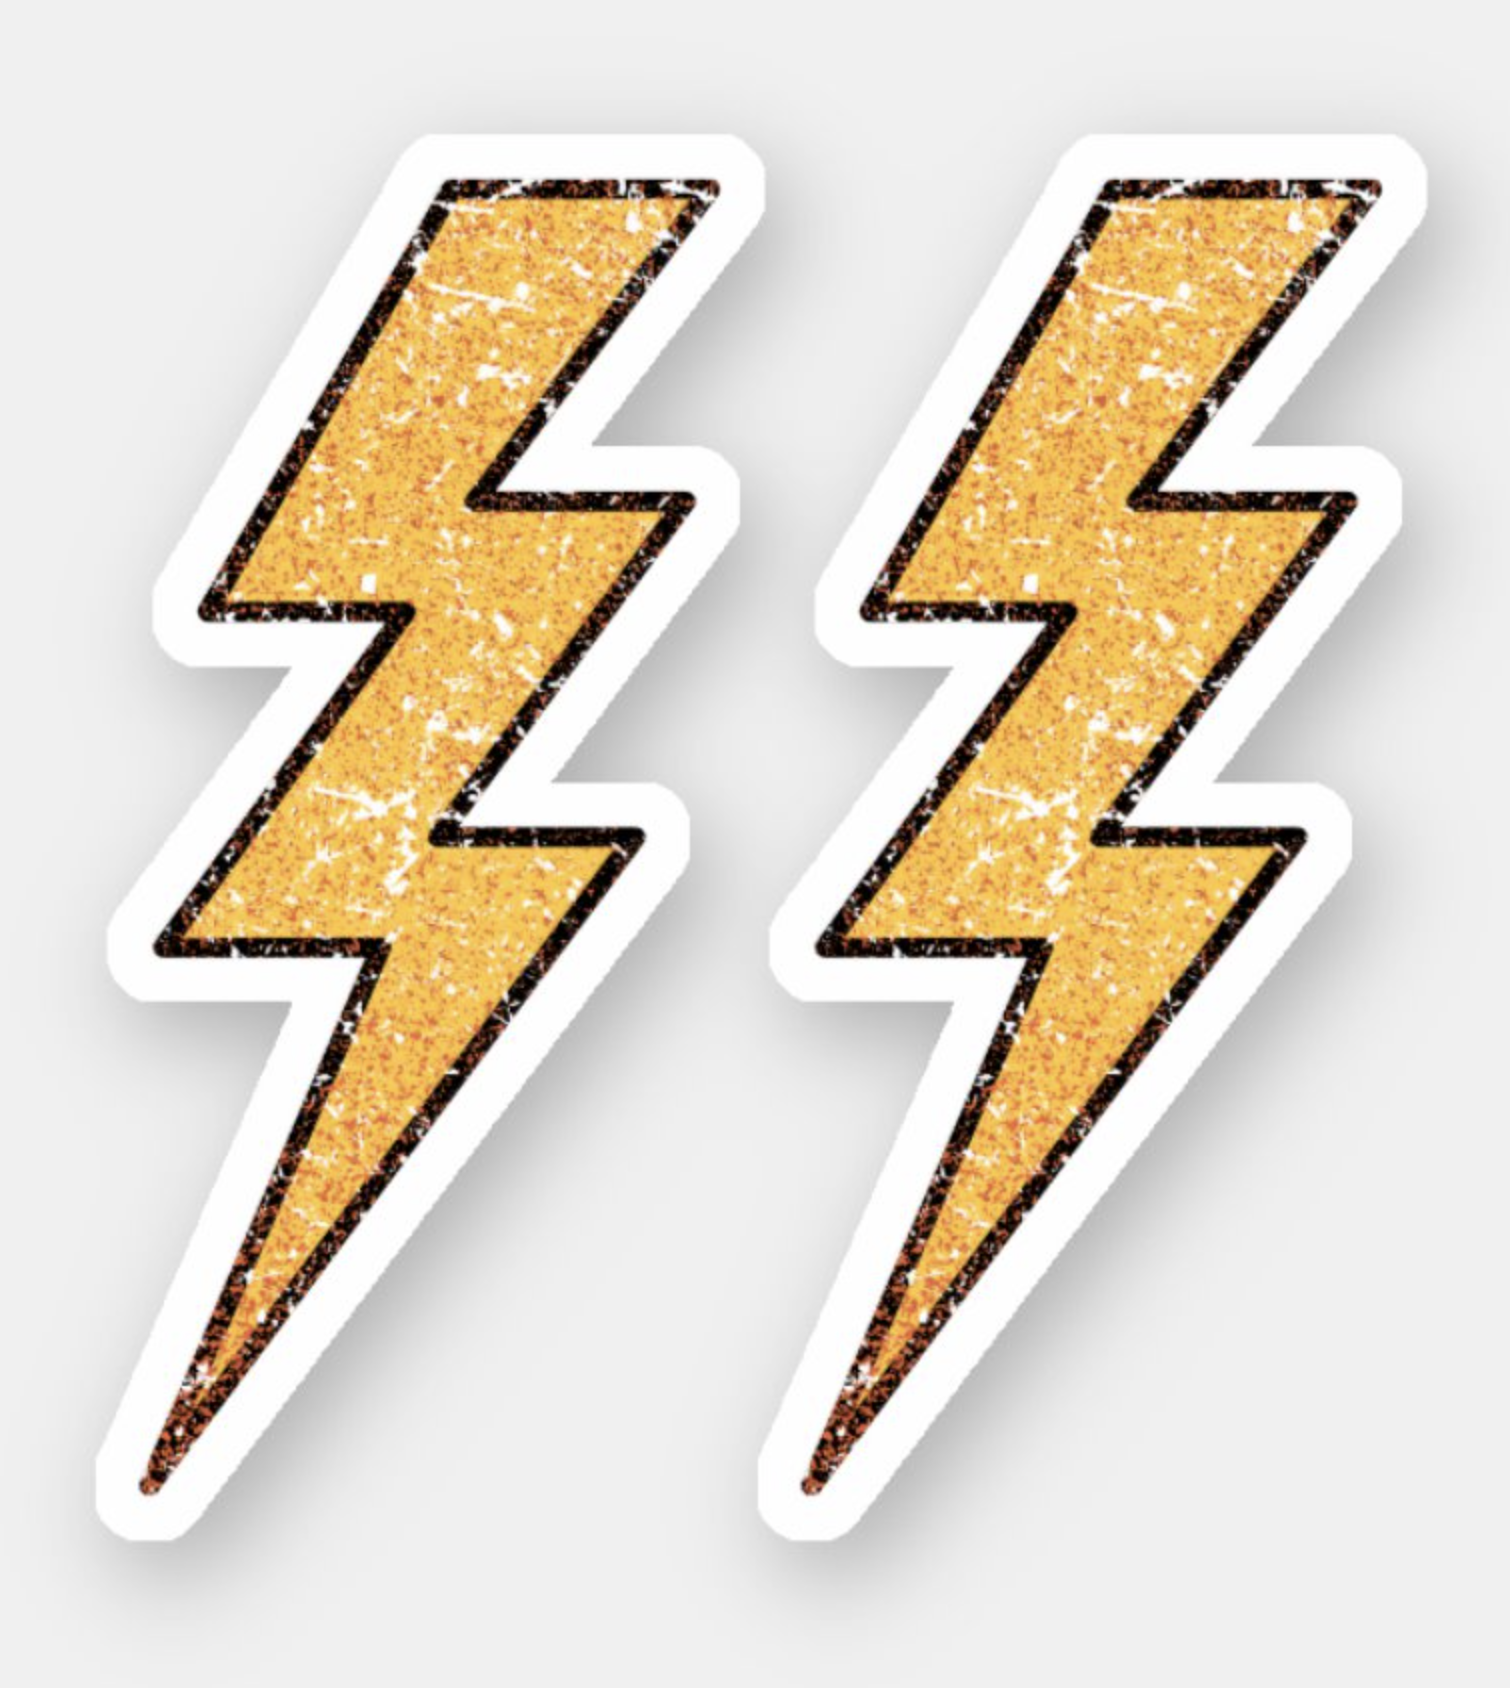 Worn Distressed Peeling Paint Lightning Bolts Sticker Zazzle Com In 2020 Lightning Bolt Lightning Distressed Texture